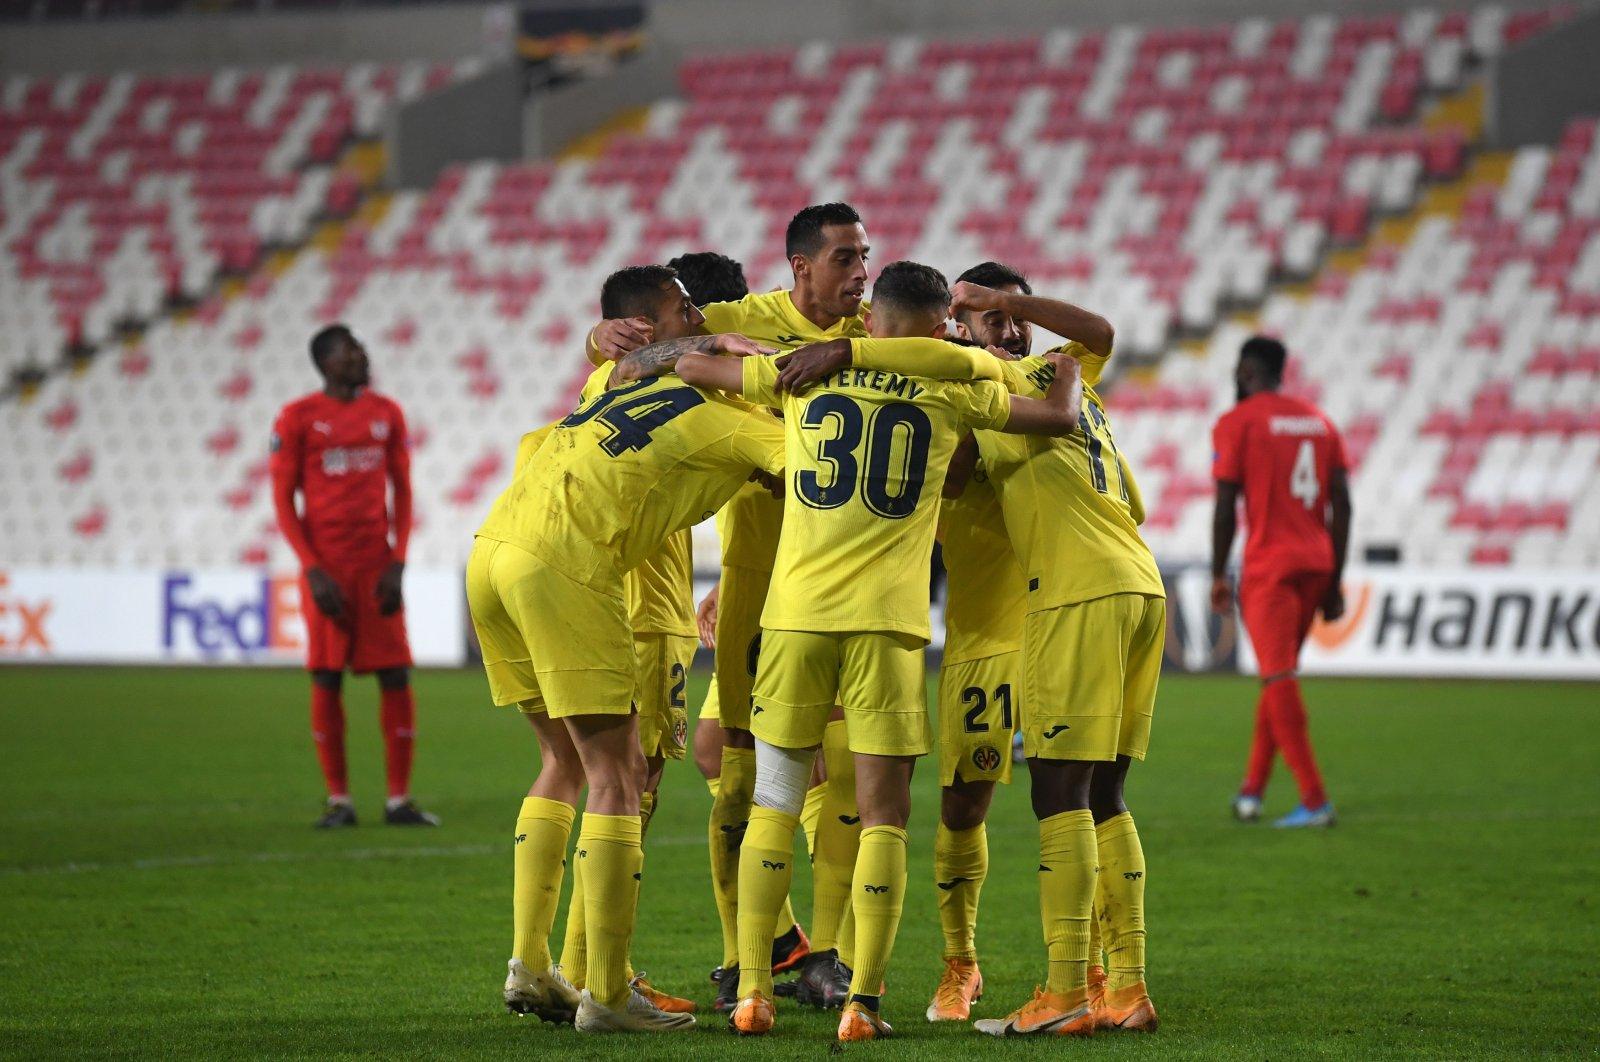 Villareal players celebrate a goal during the UEFA Europa League Group I match against Turkey's Sivasspor, at the 4 Eylül Stadium in Sivas, Turkey, Dec. 3, 2020. (AFP Photo)